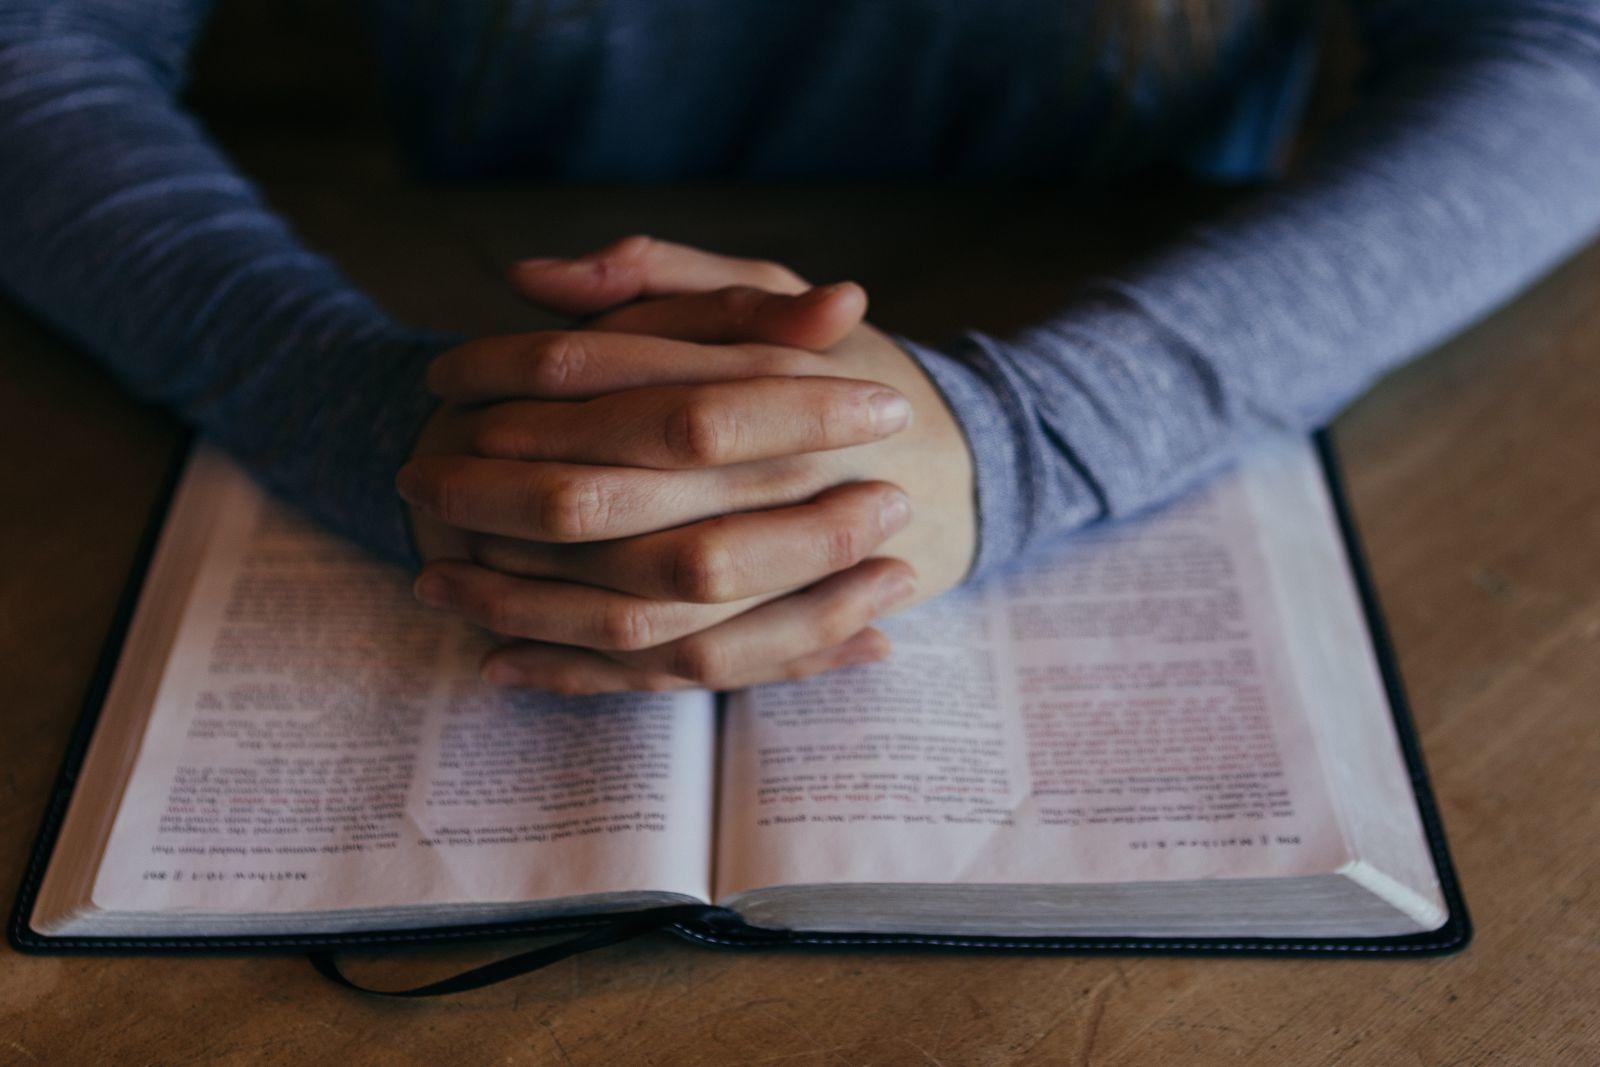 Alberta Chill For Public Prayer